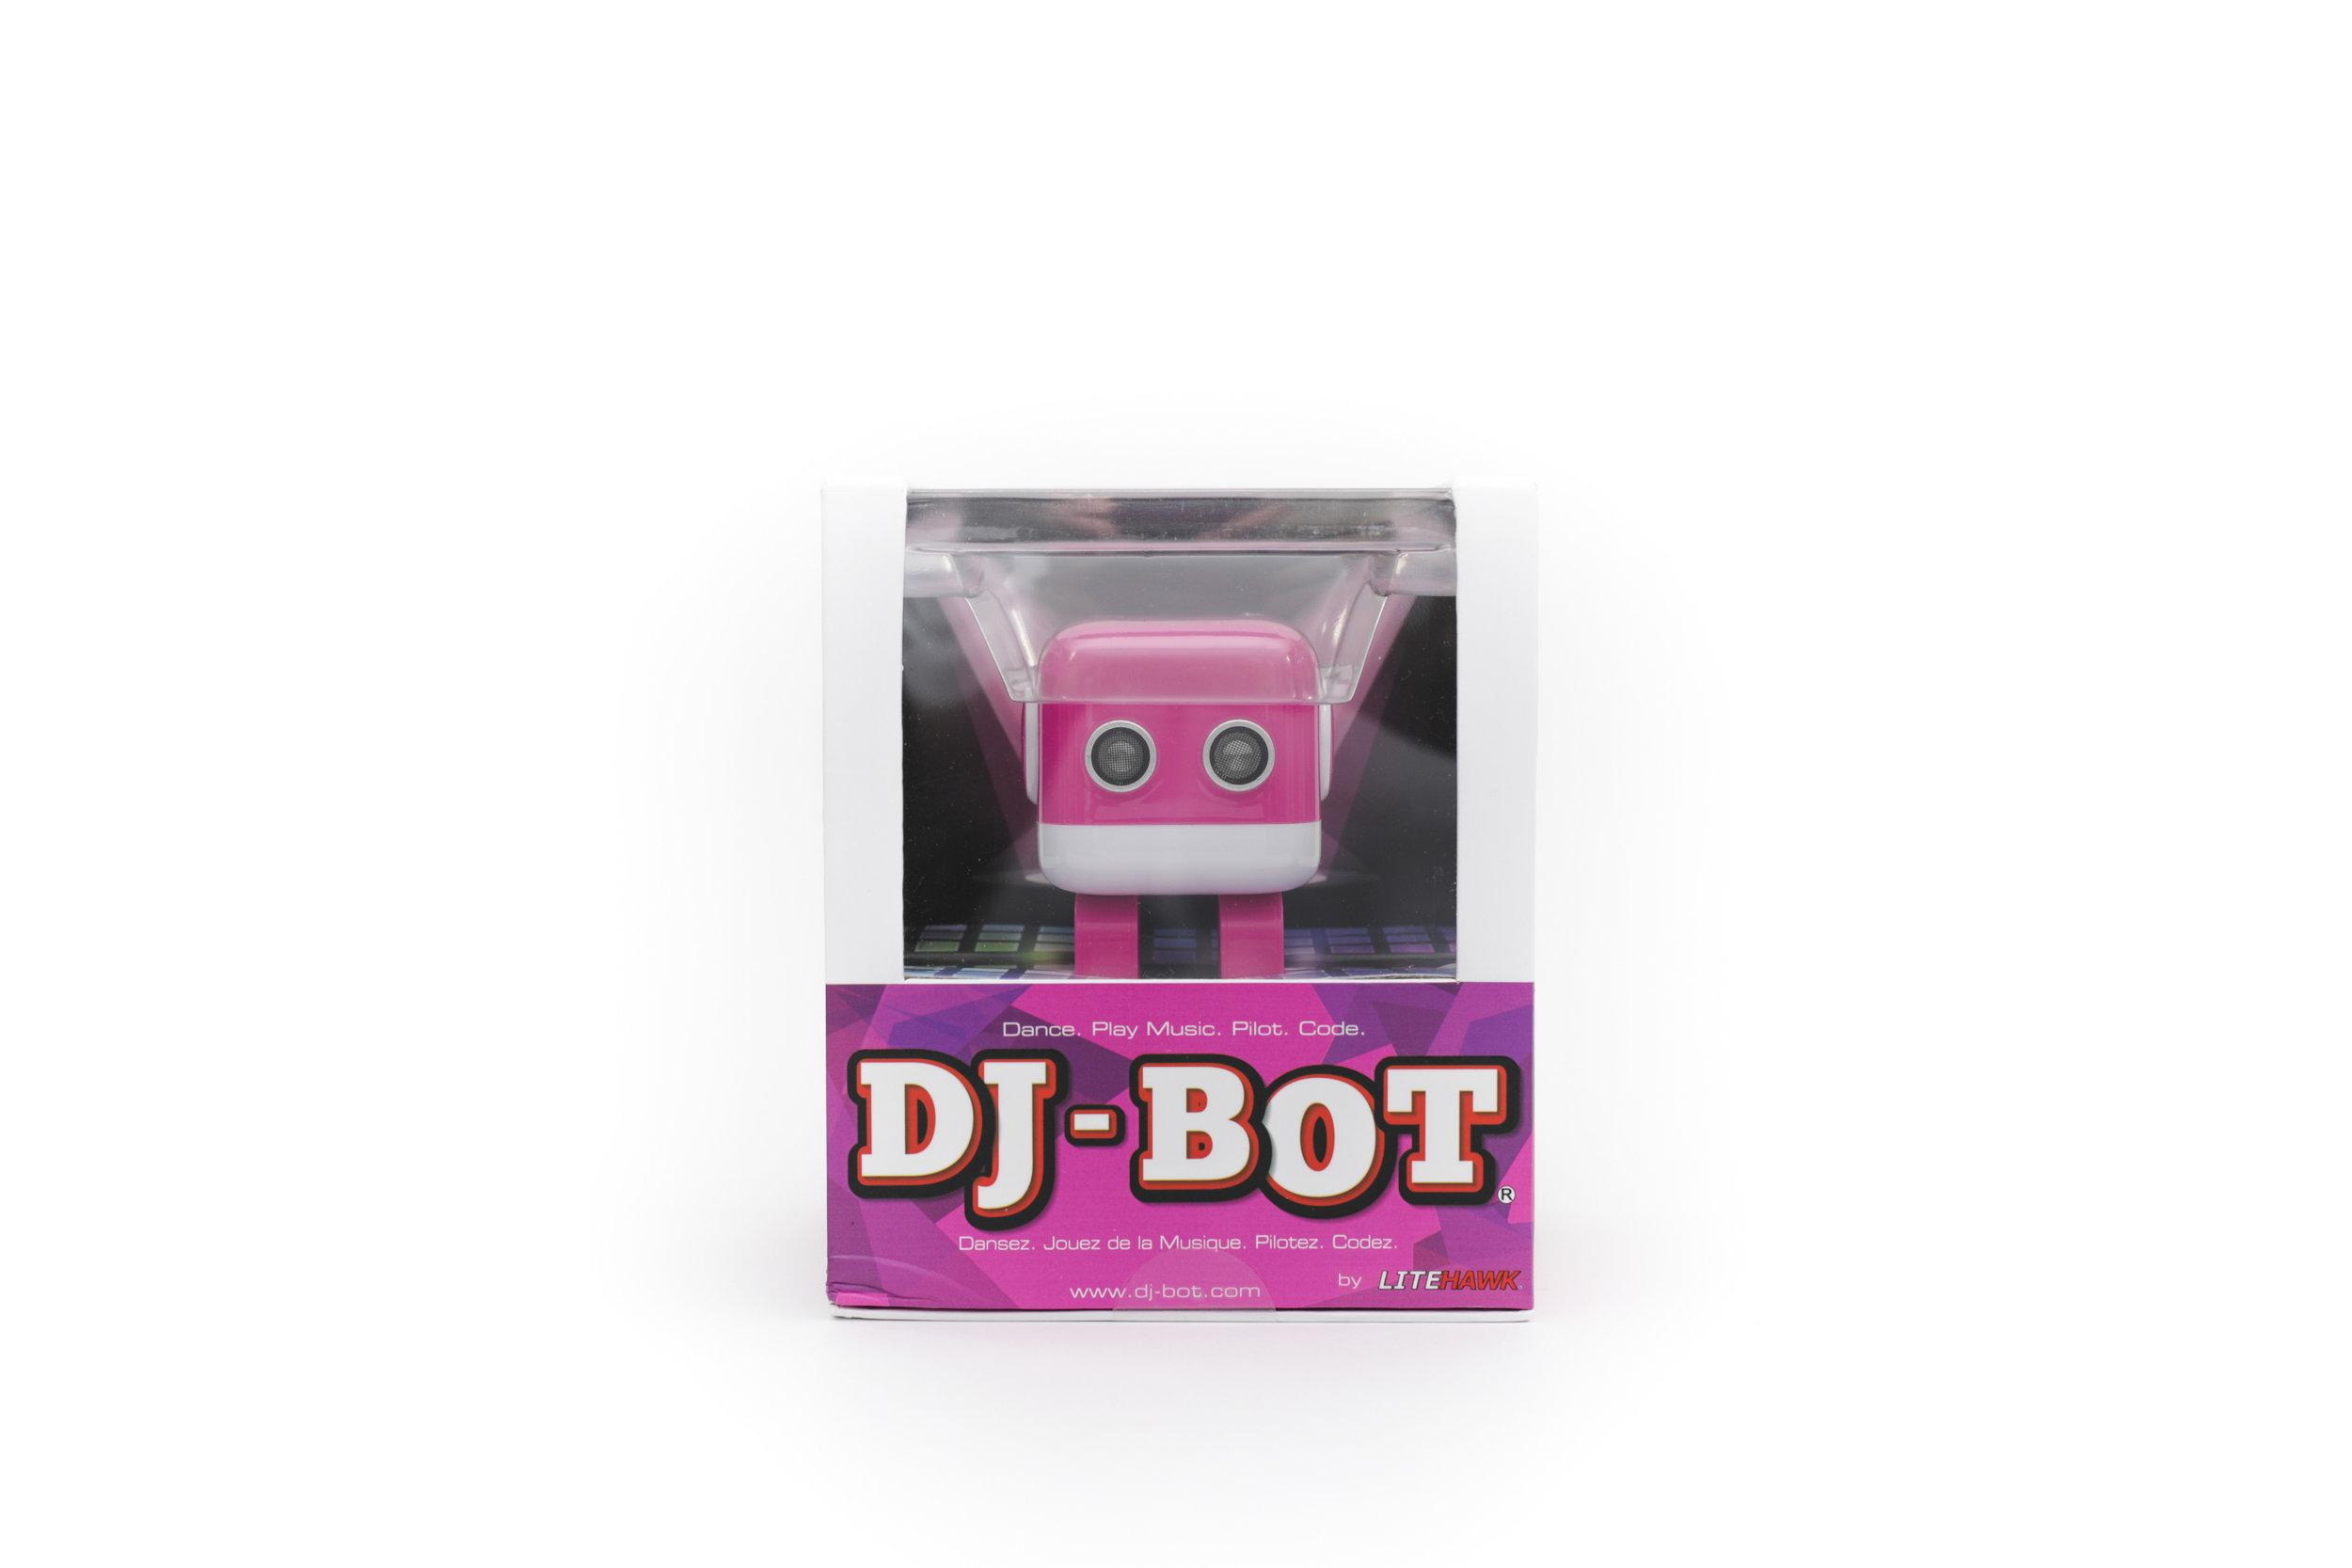 DJ BOT Box (4 of 6).jpg